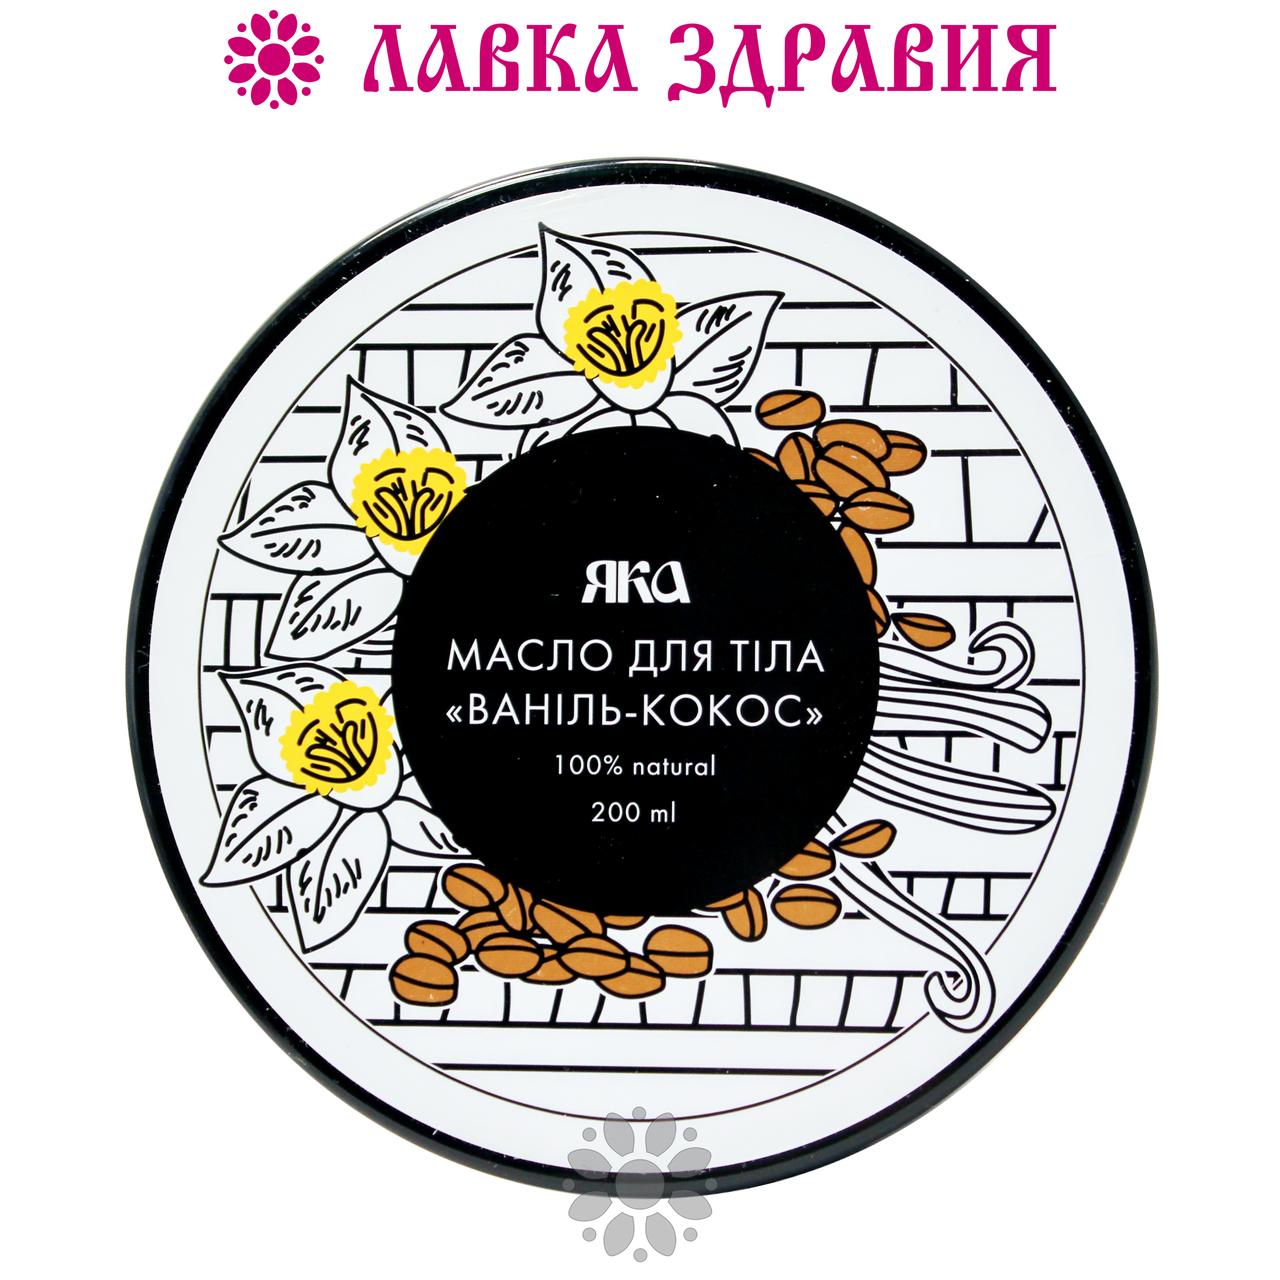 Масло для тела Ваниль-Кокос, 200 г, Яка